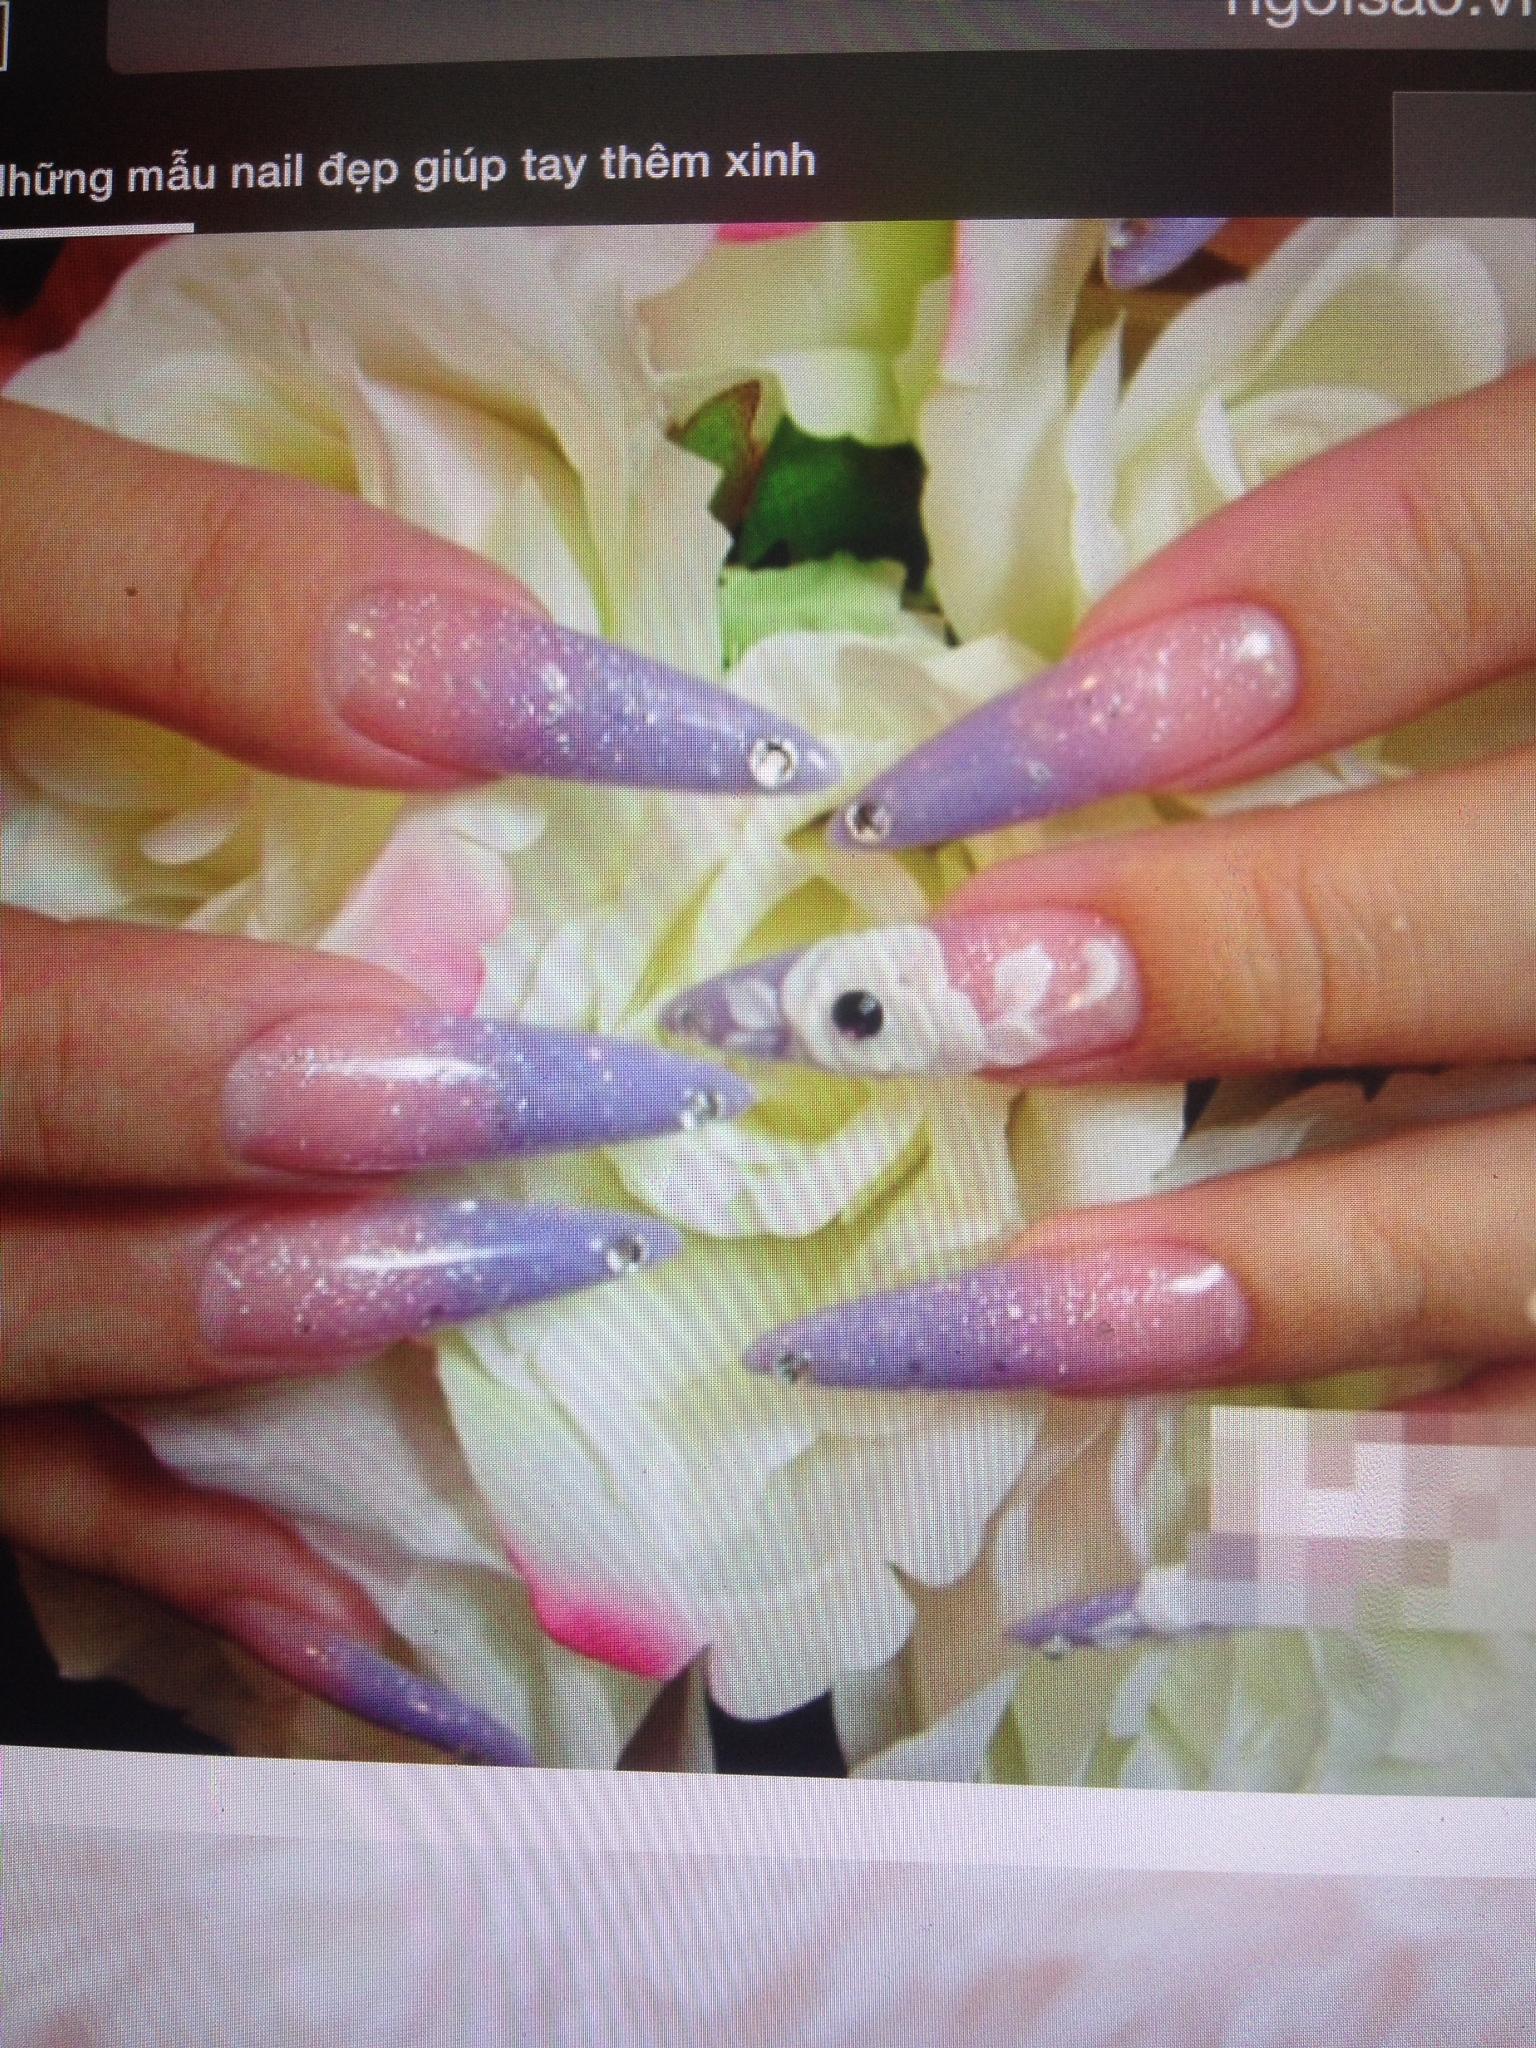 Nice Nails 818 W Broadway Rd Ste 105, Tempe, AZ 85282 - YP.com